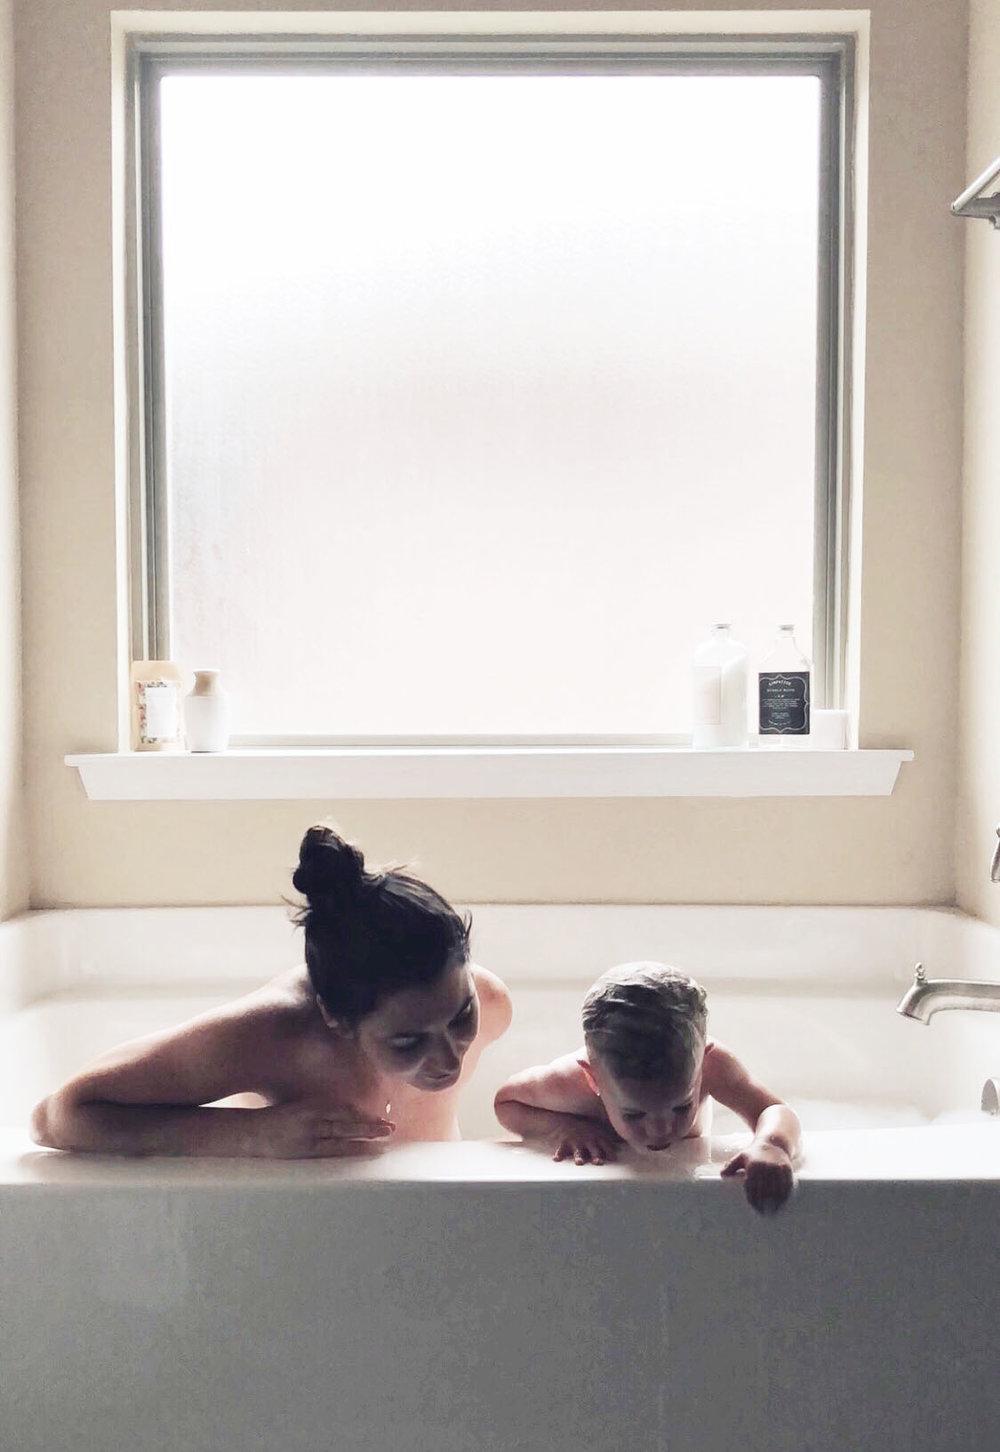 Bathtime, Mom and Baby